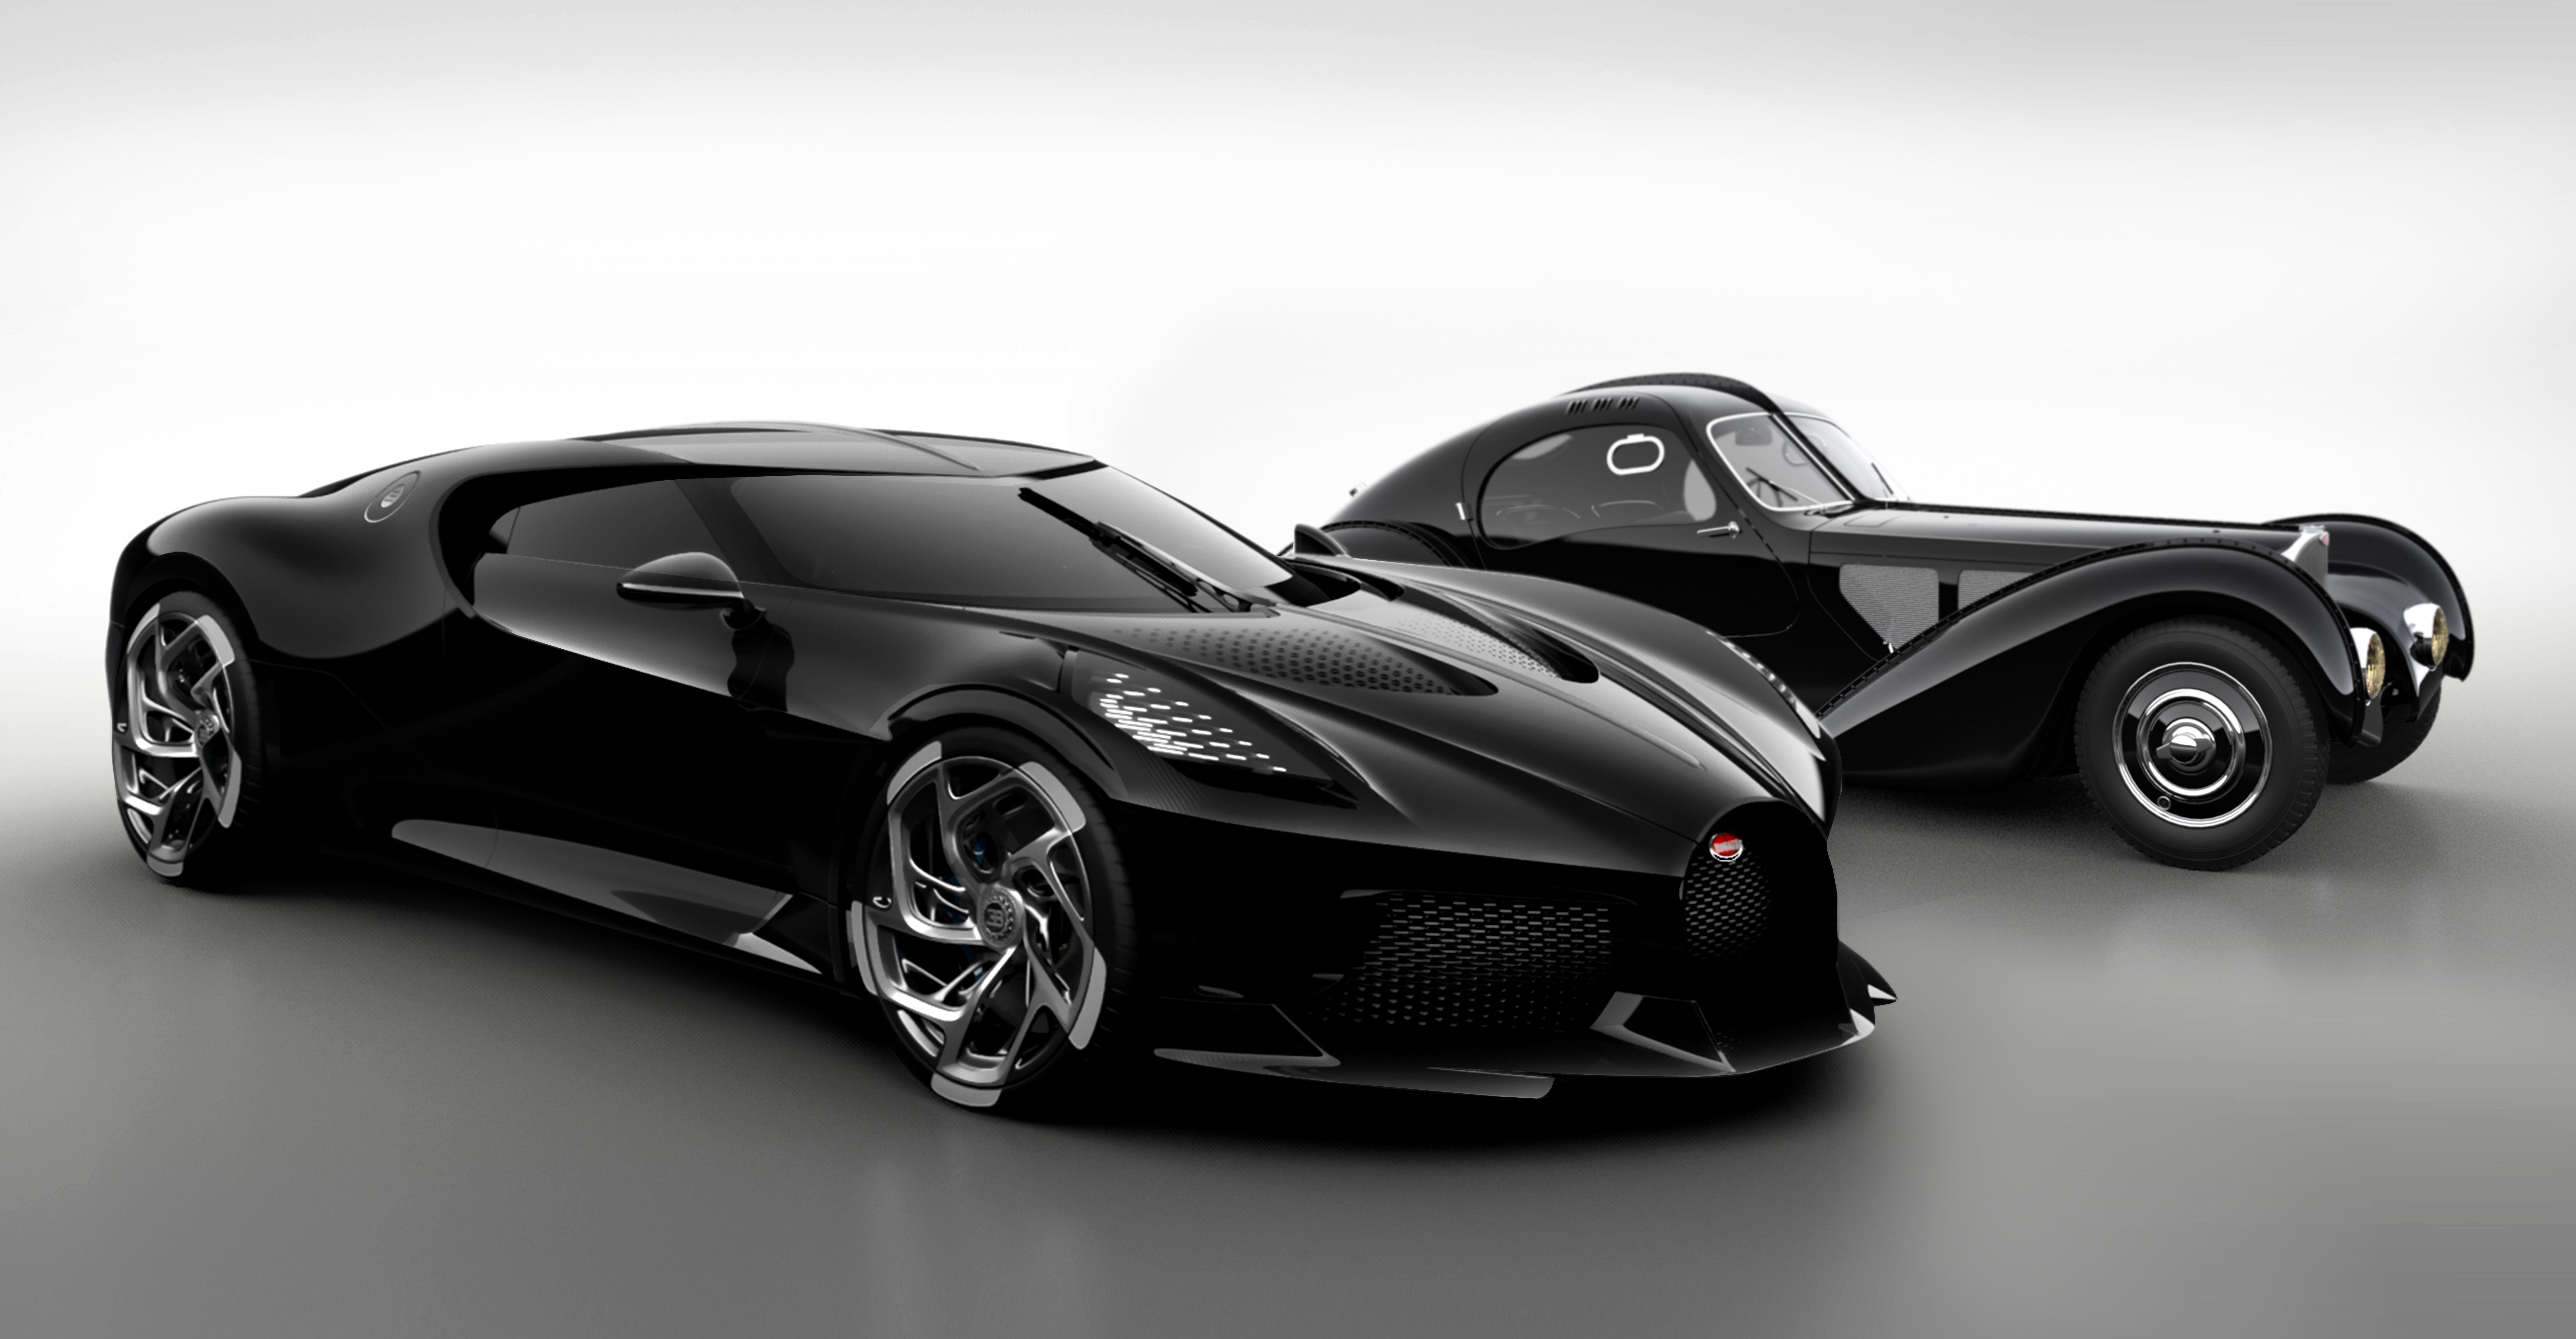 Bugatti S La Voiture Noire Is The Most Expensive New Car Ever Built Classic Driver Magazine Black Car Bugatti New Cars